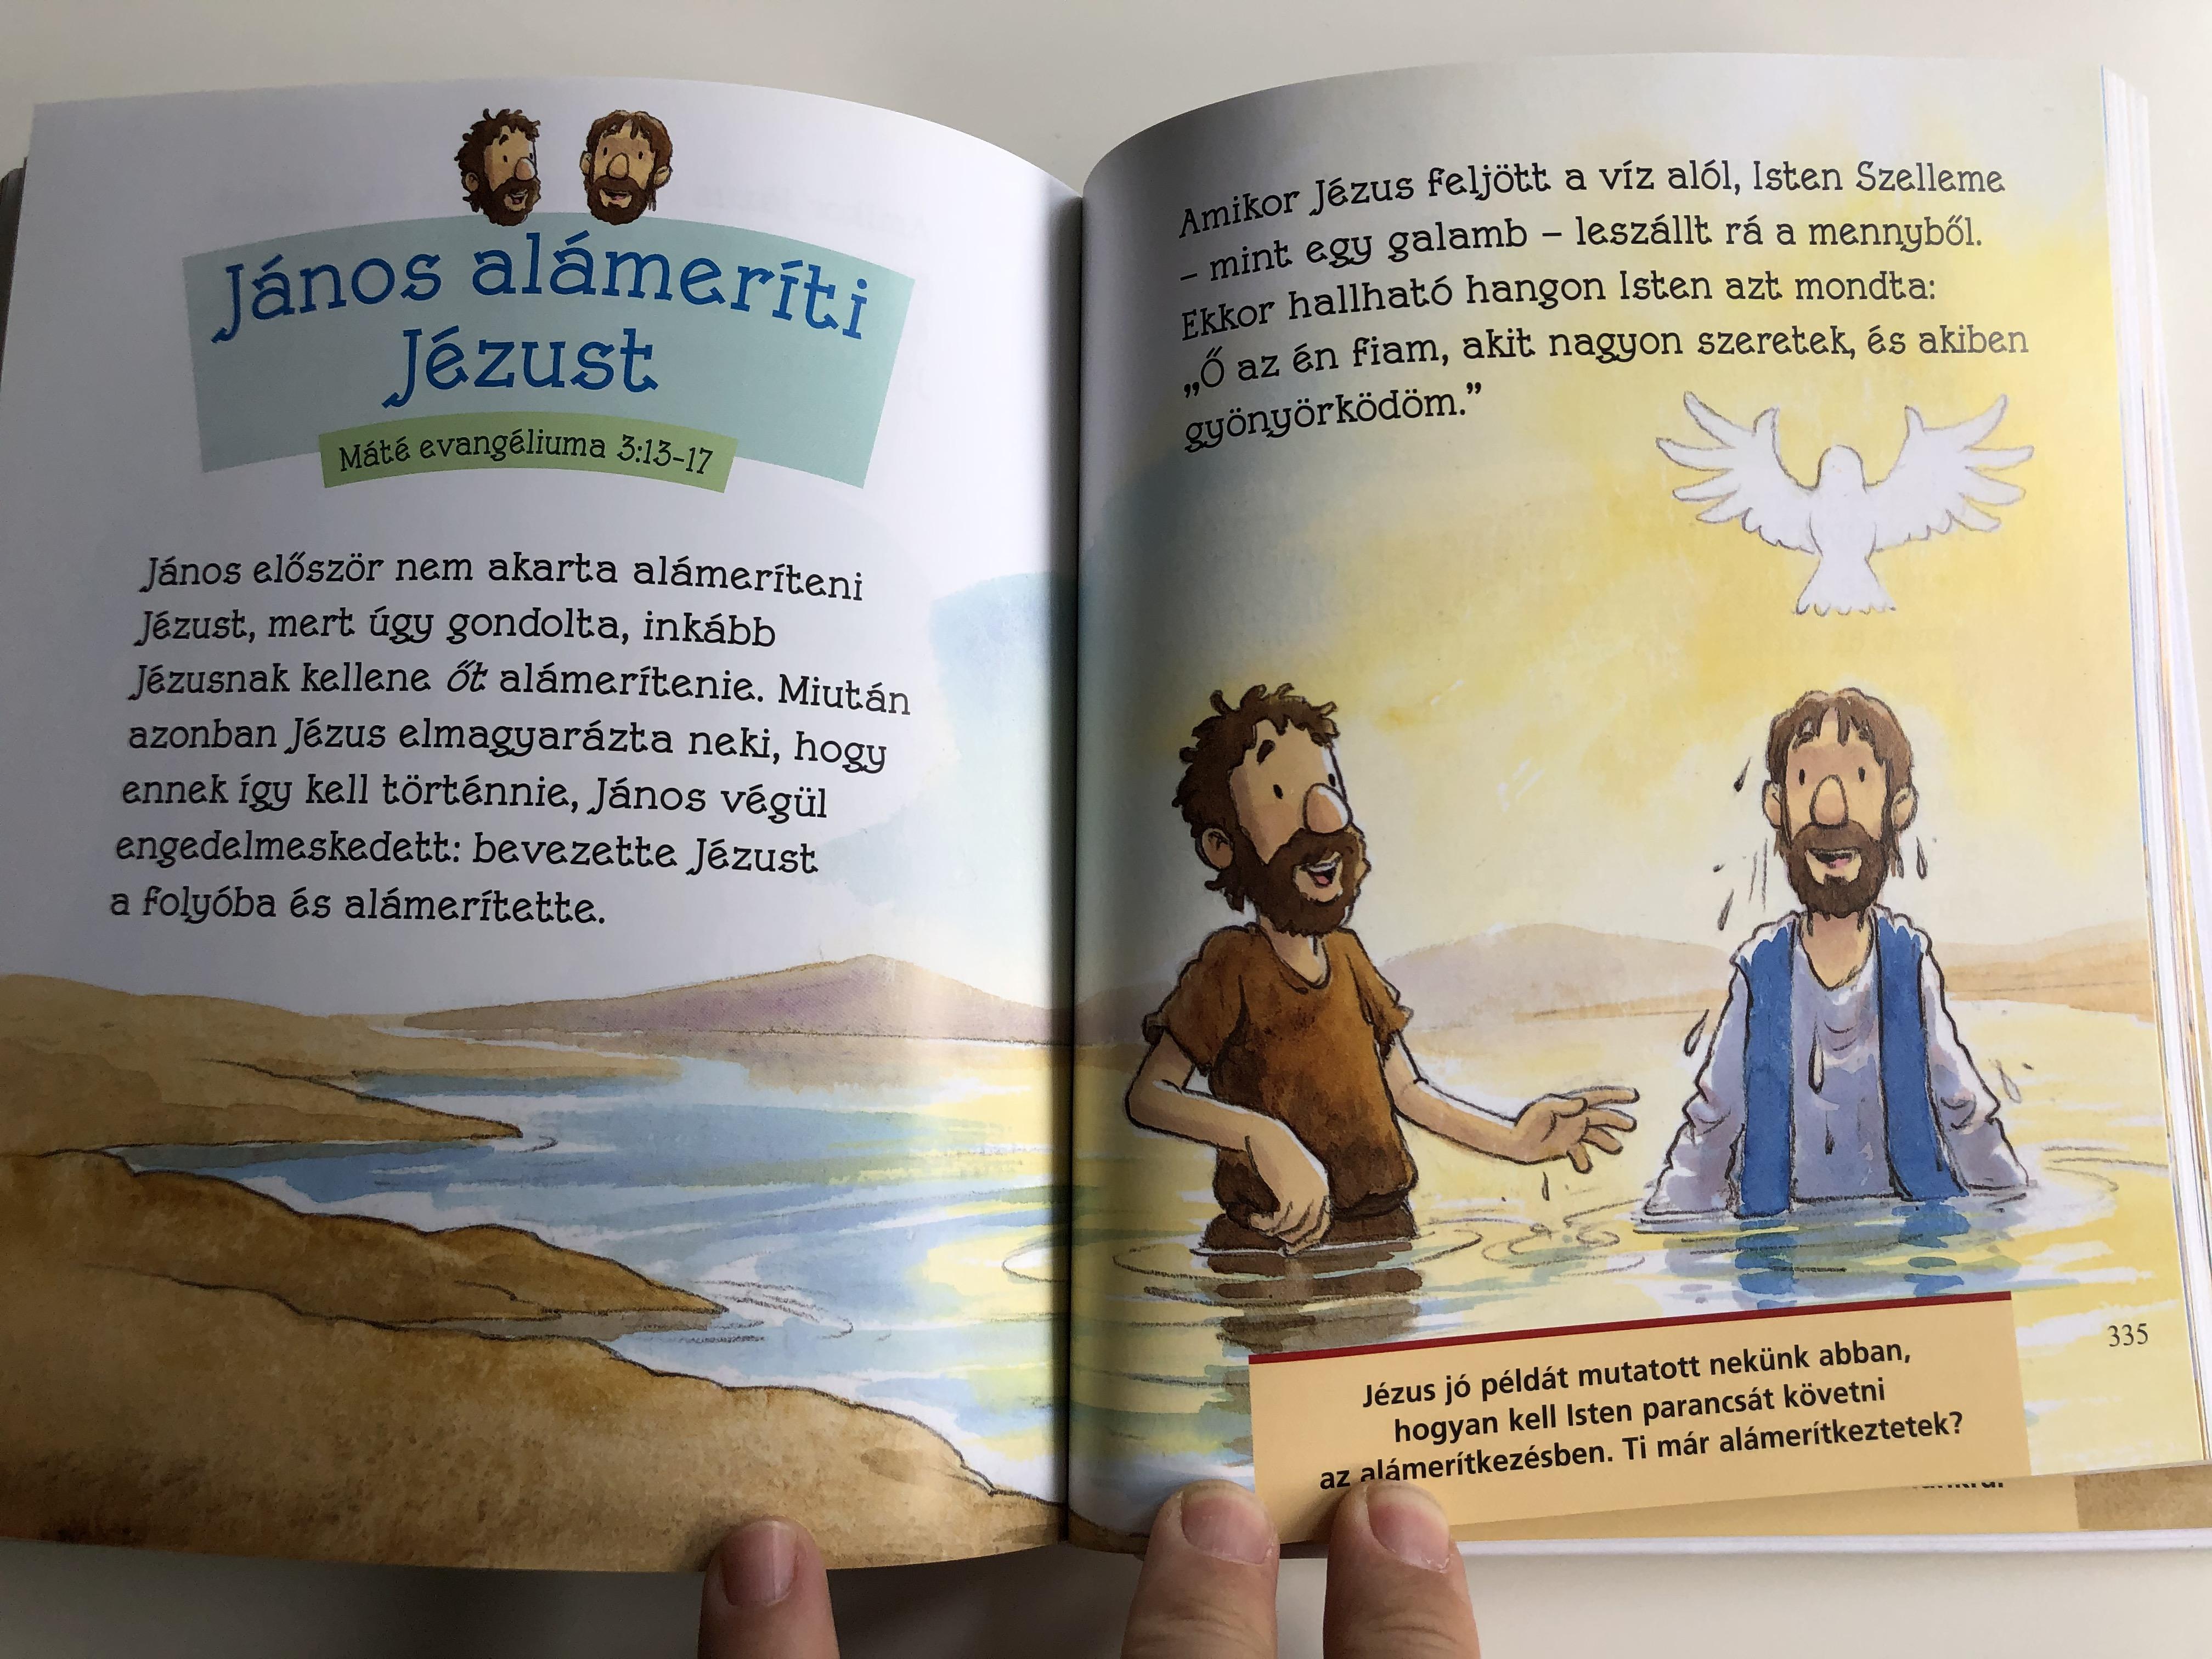 gyerekek-bibli-ja-hungarian-edition-of-read-share-bible-by-gwen-ellis-16.jpg